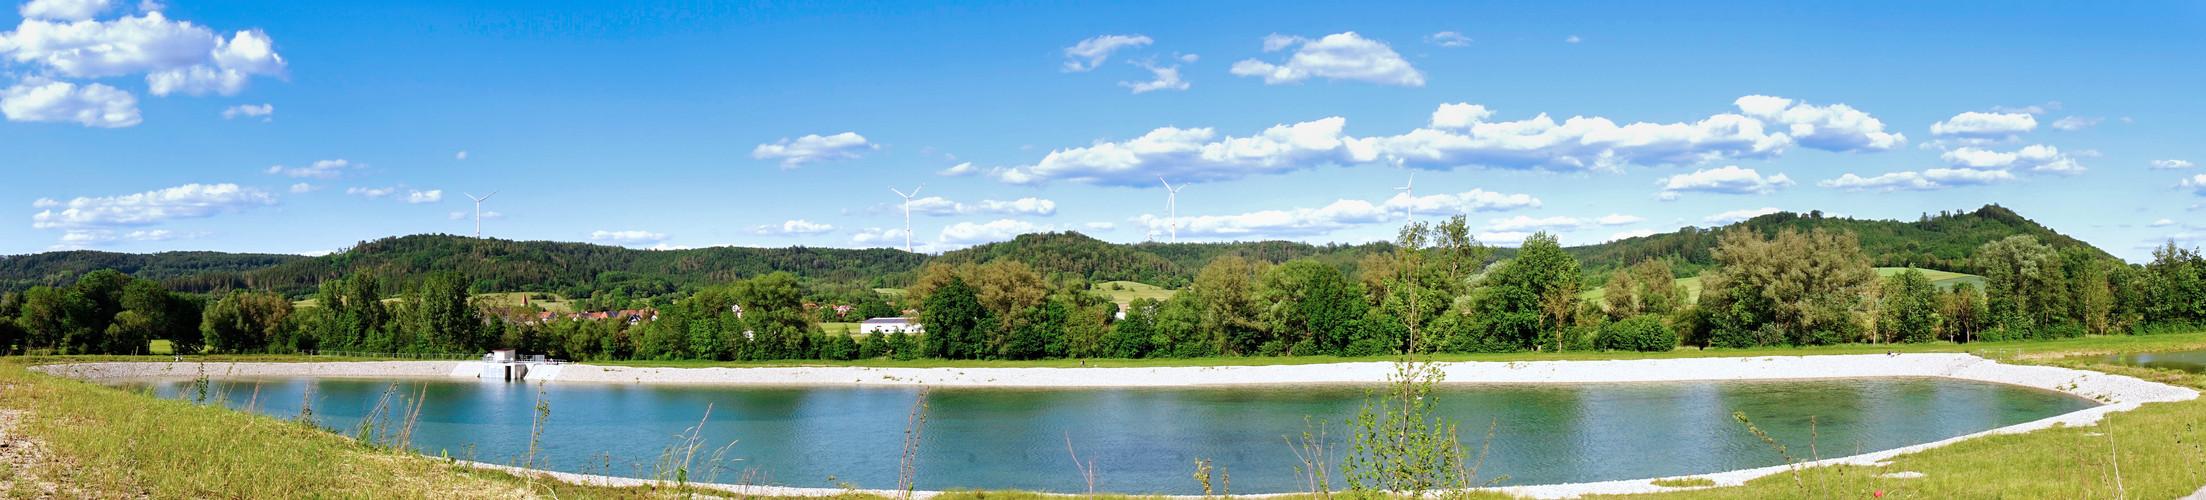 Panoramaaufnahme Wasserrückhaltebecken